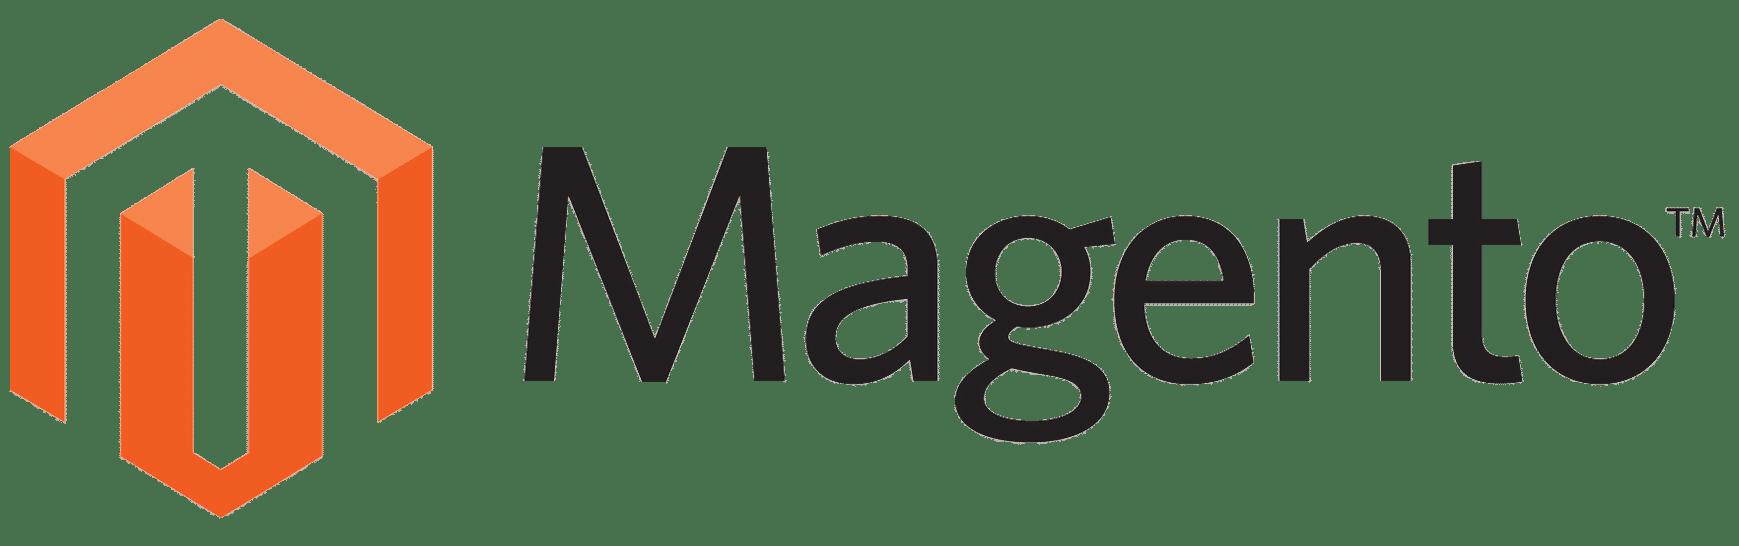 Las Vegas Magento Development